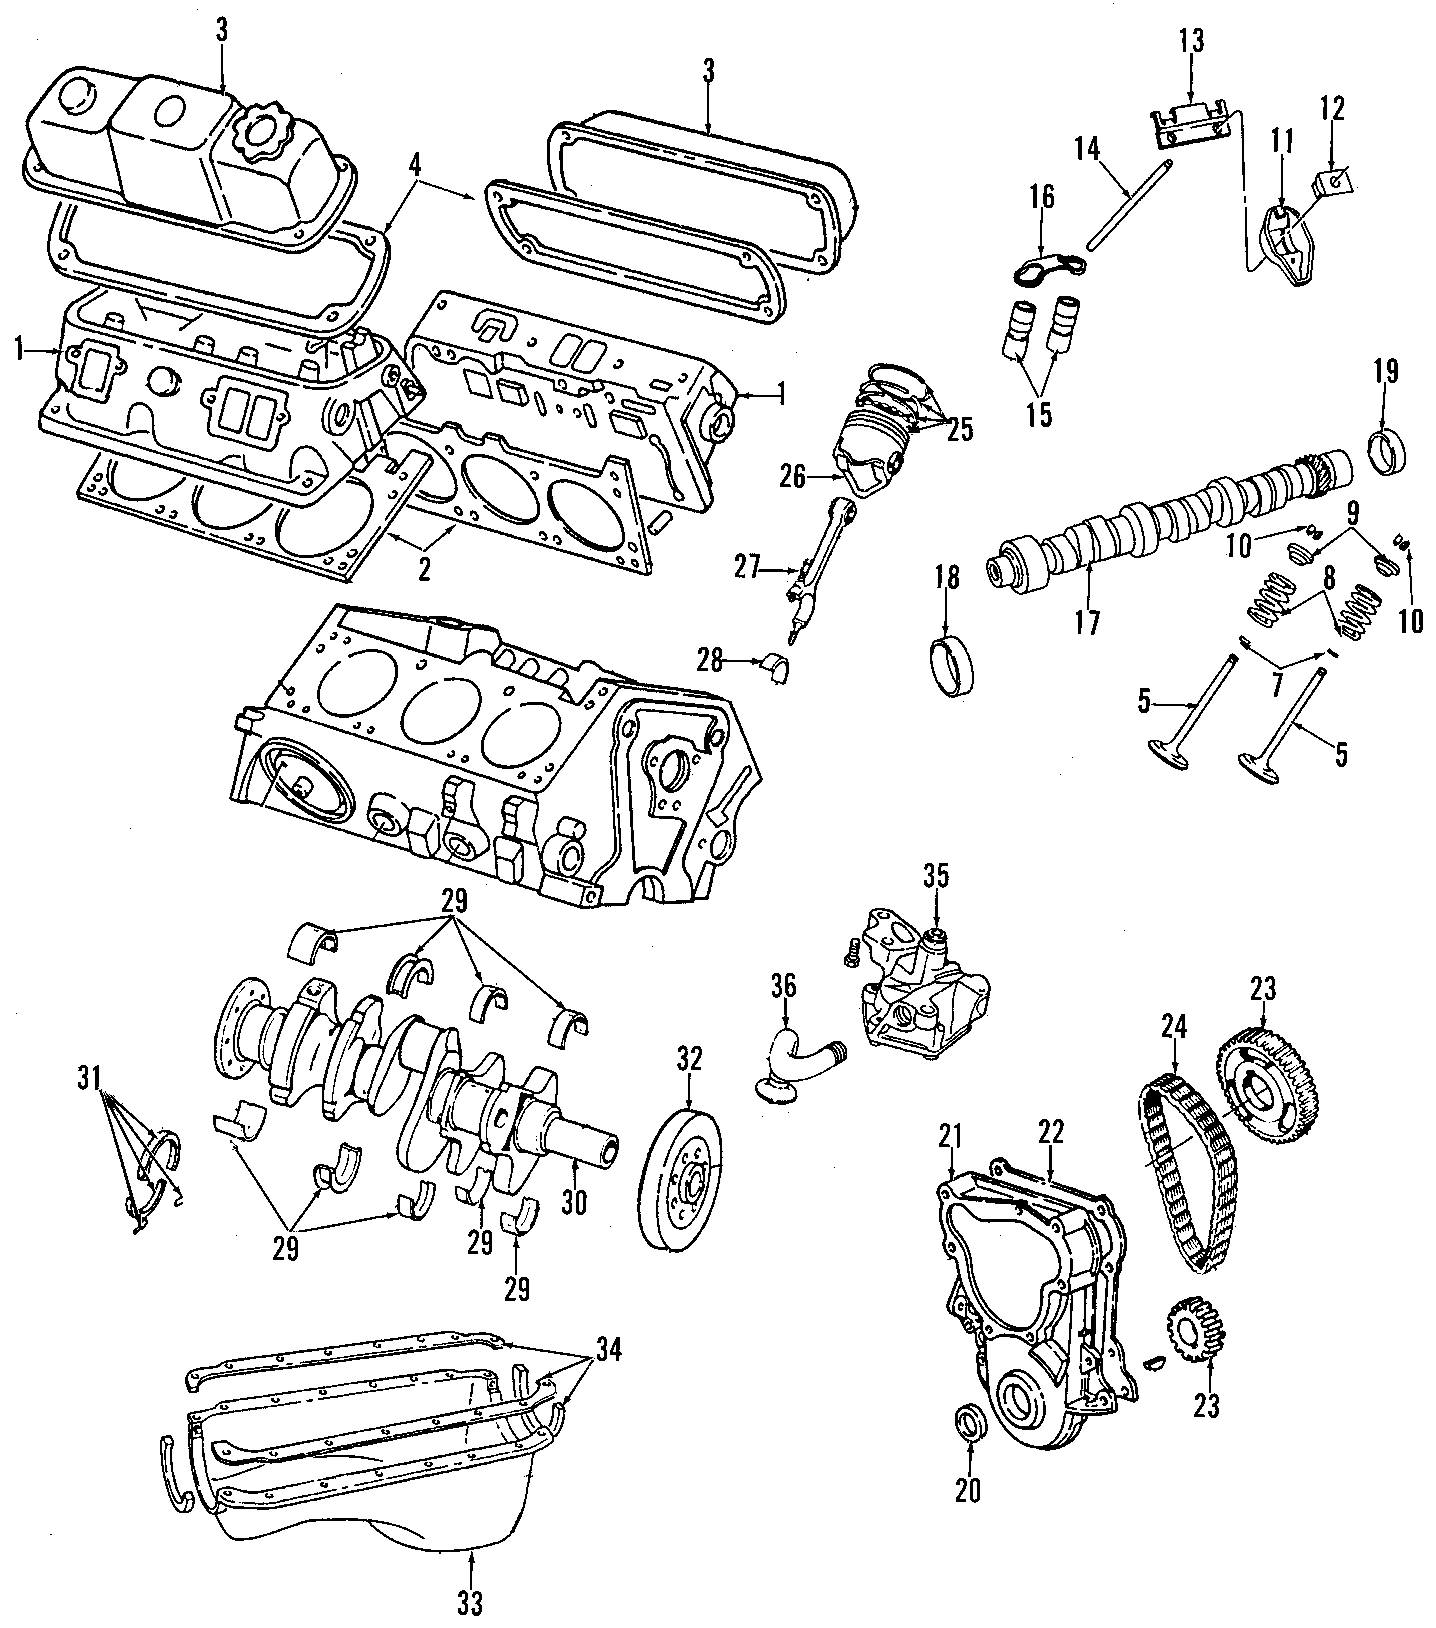 Dodge Dakota Engine Rocker Arm. Engine Rocker Arm. ROCKER